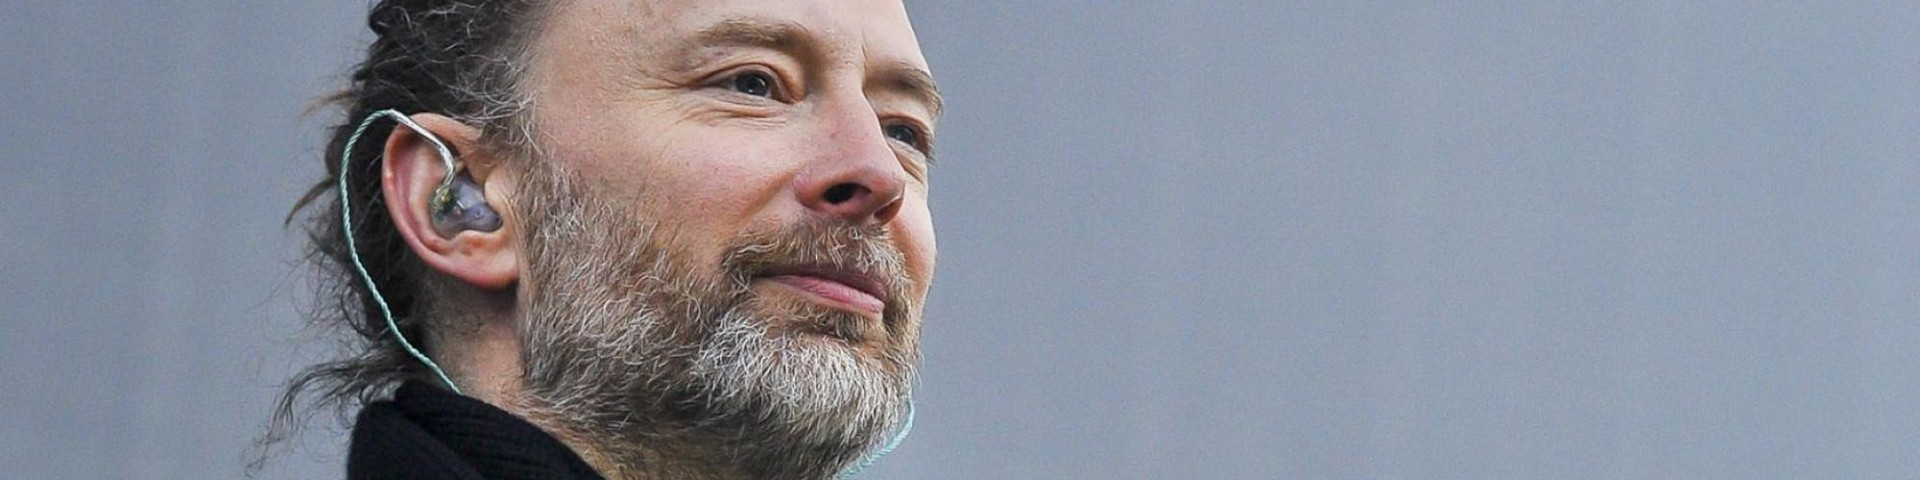 Thom Yorke a Milano – 9/07